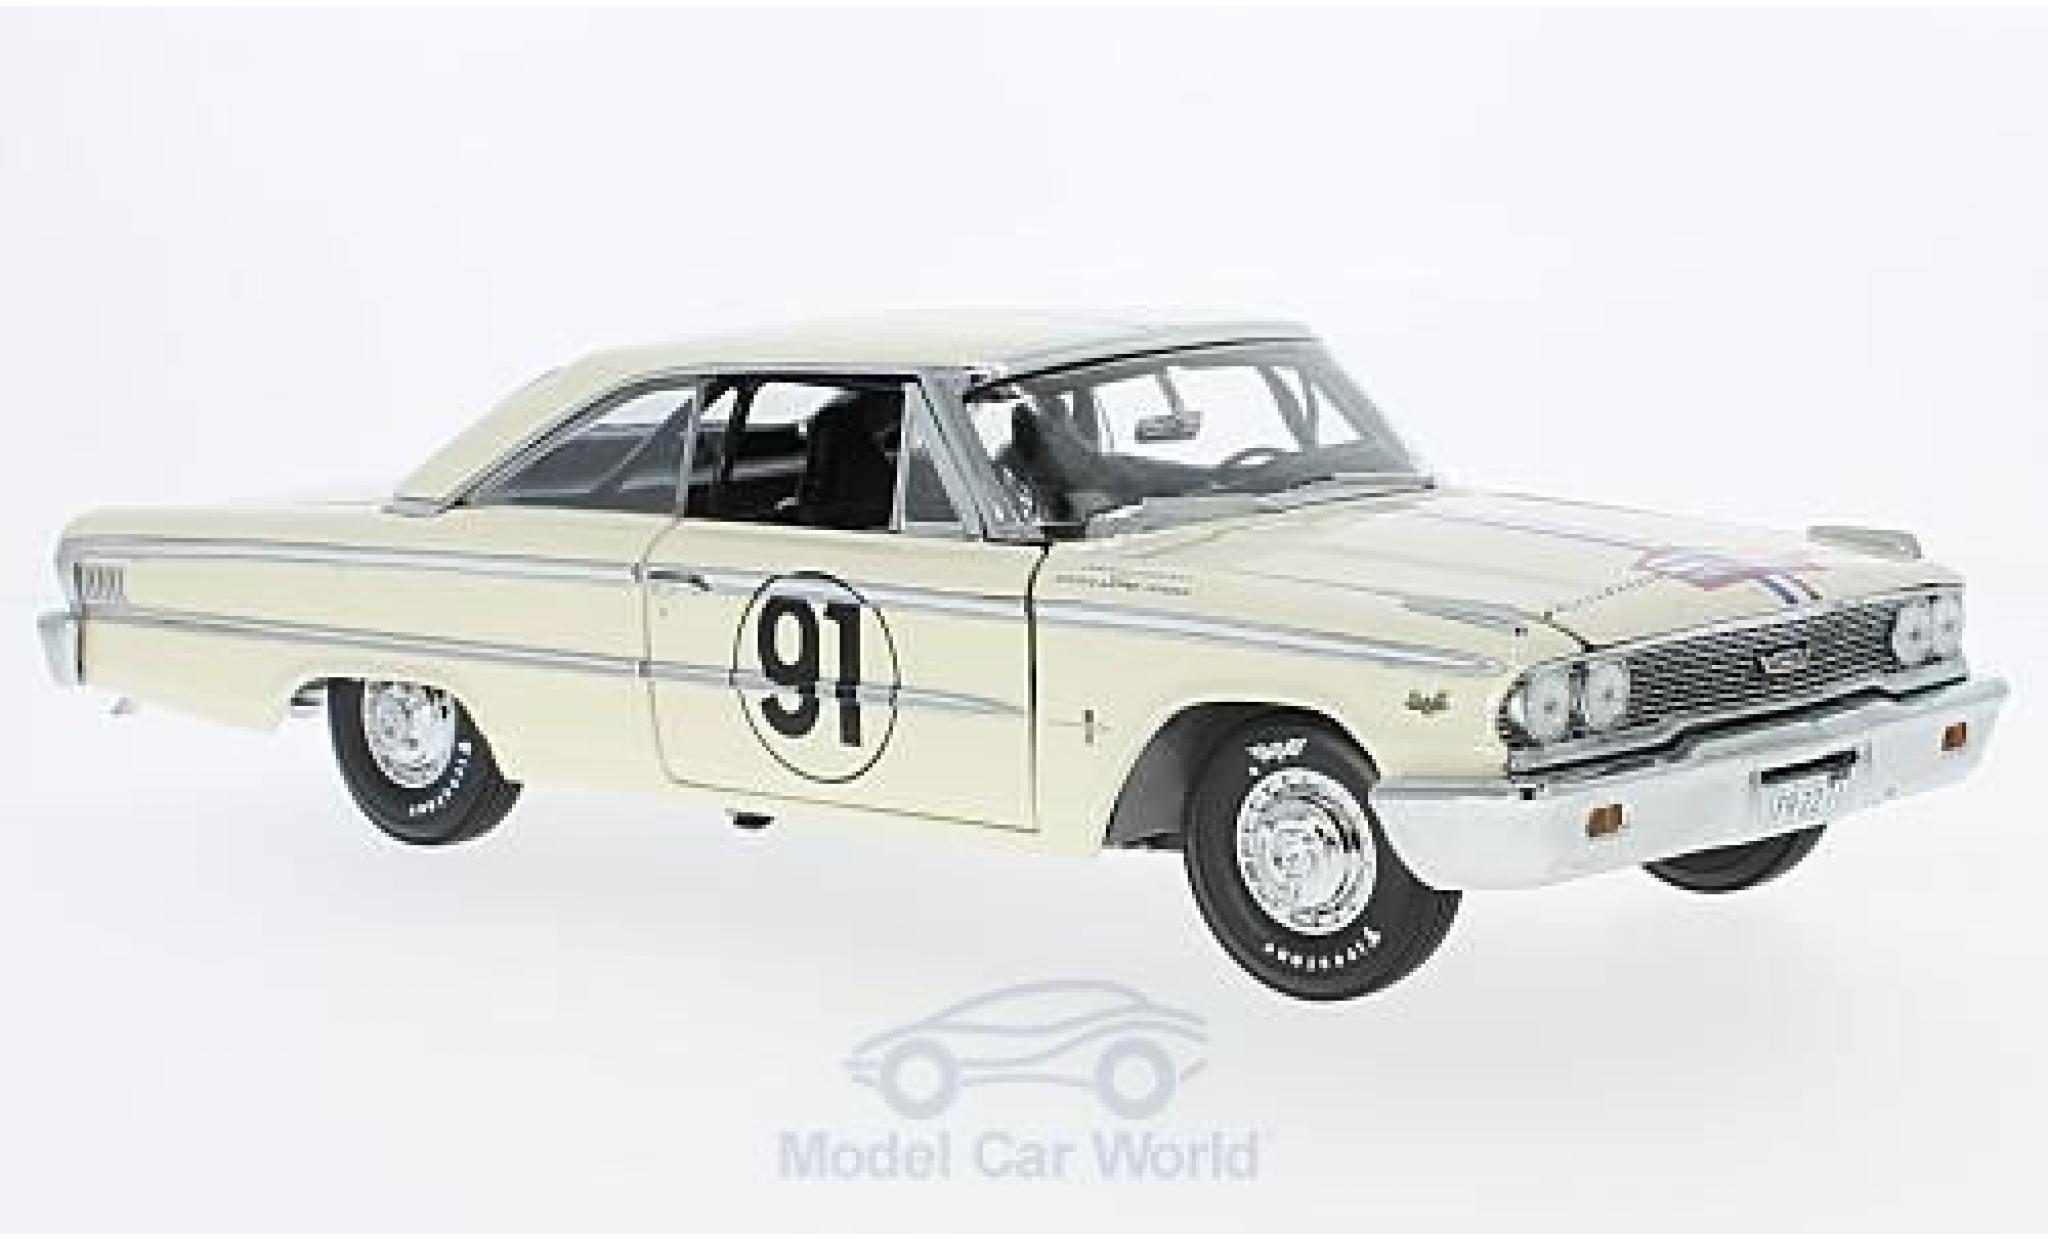 Ford Galaxy 1/18 Sun Star Galaxie 500 XL No.91 Tour de France Auto 1963 H.Greder/M.Foulgoc